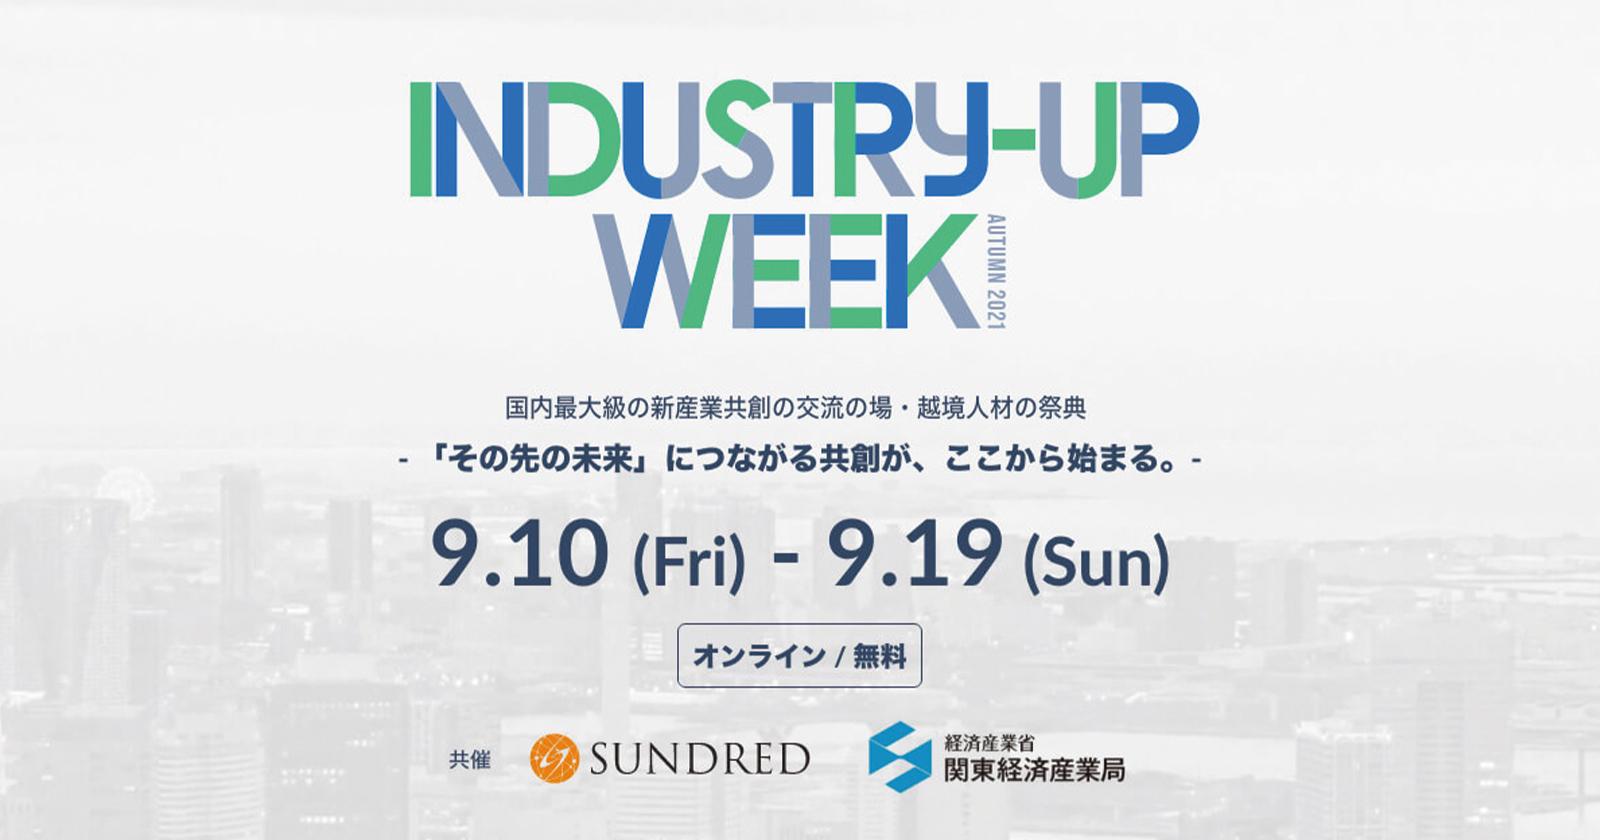 SUNDRED社が経済産業省関東経済産業局と共催する「INDUSTRY-UP WEEK 2021」のコミュニティパートナーとしてサポート